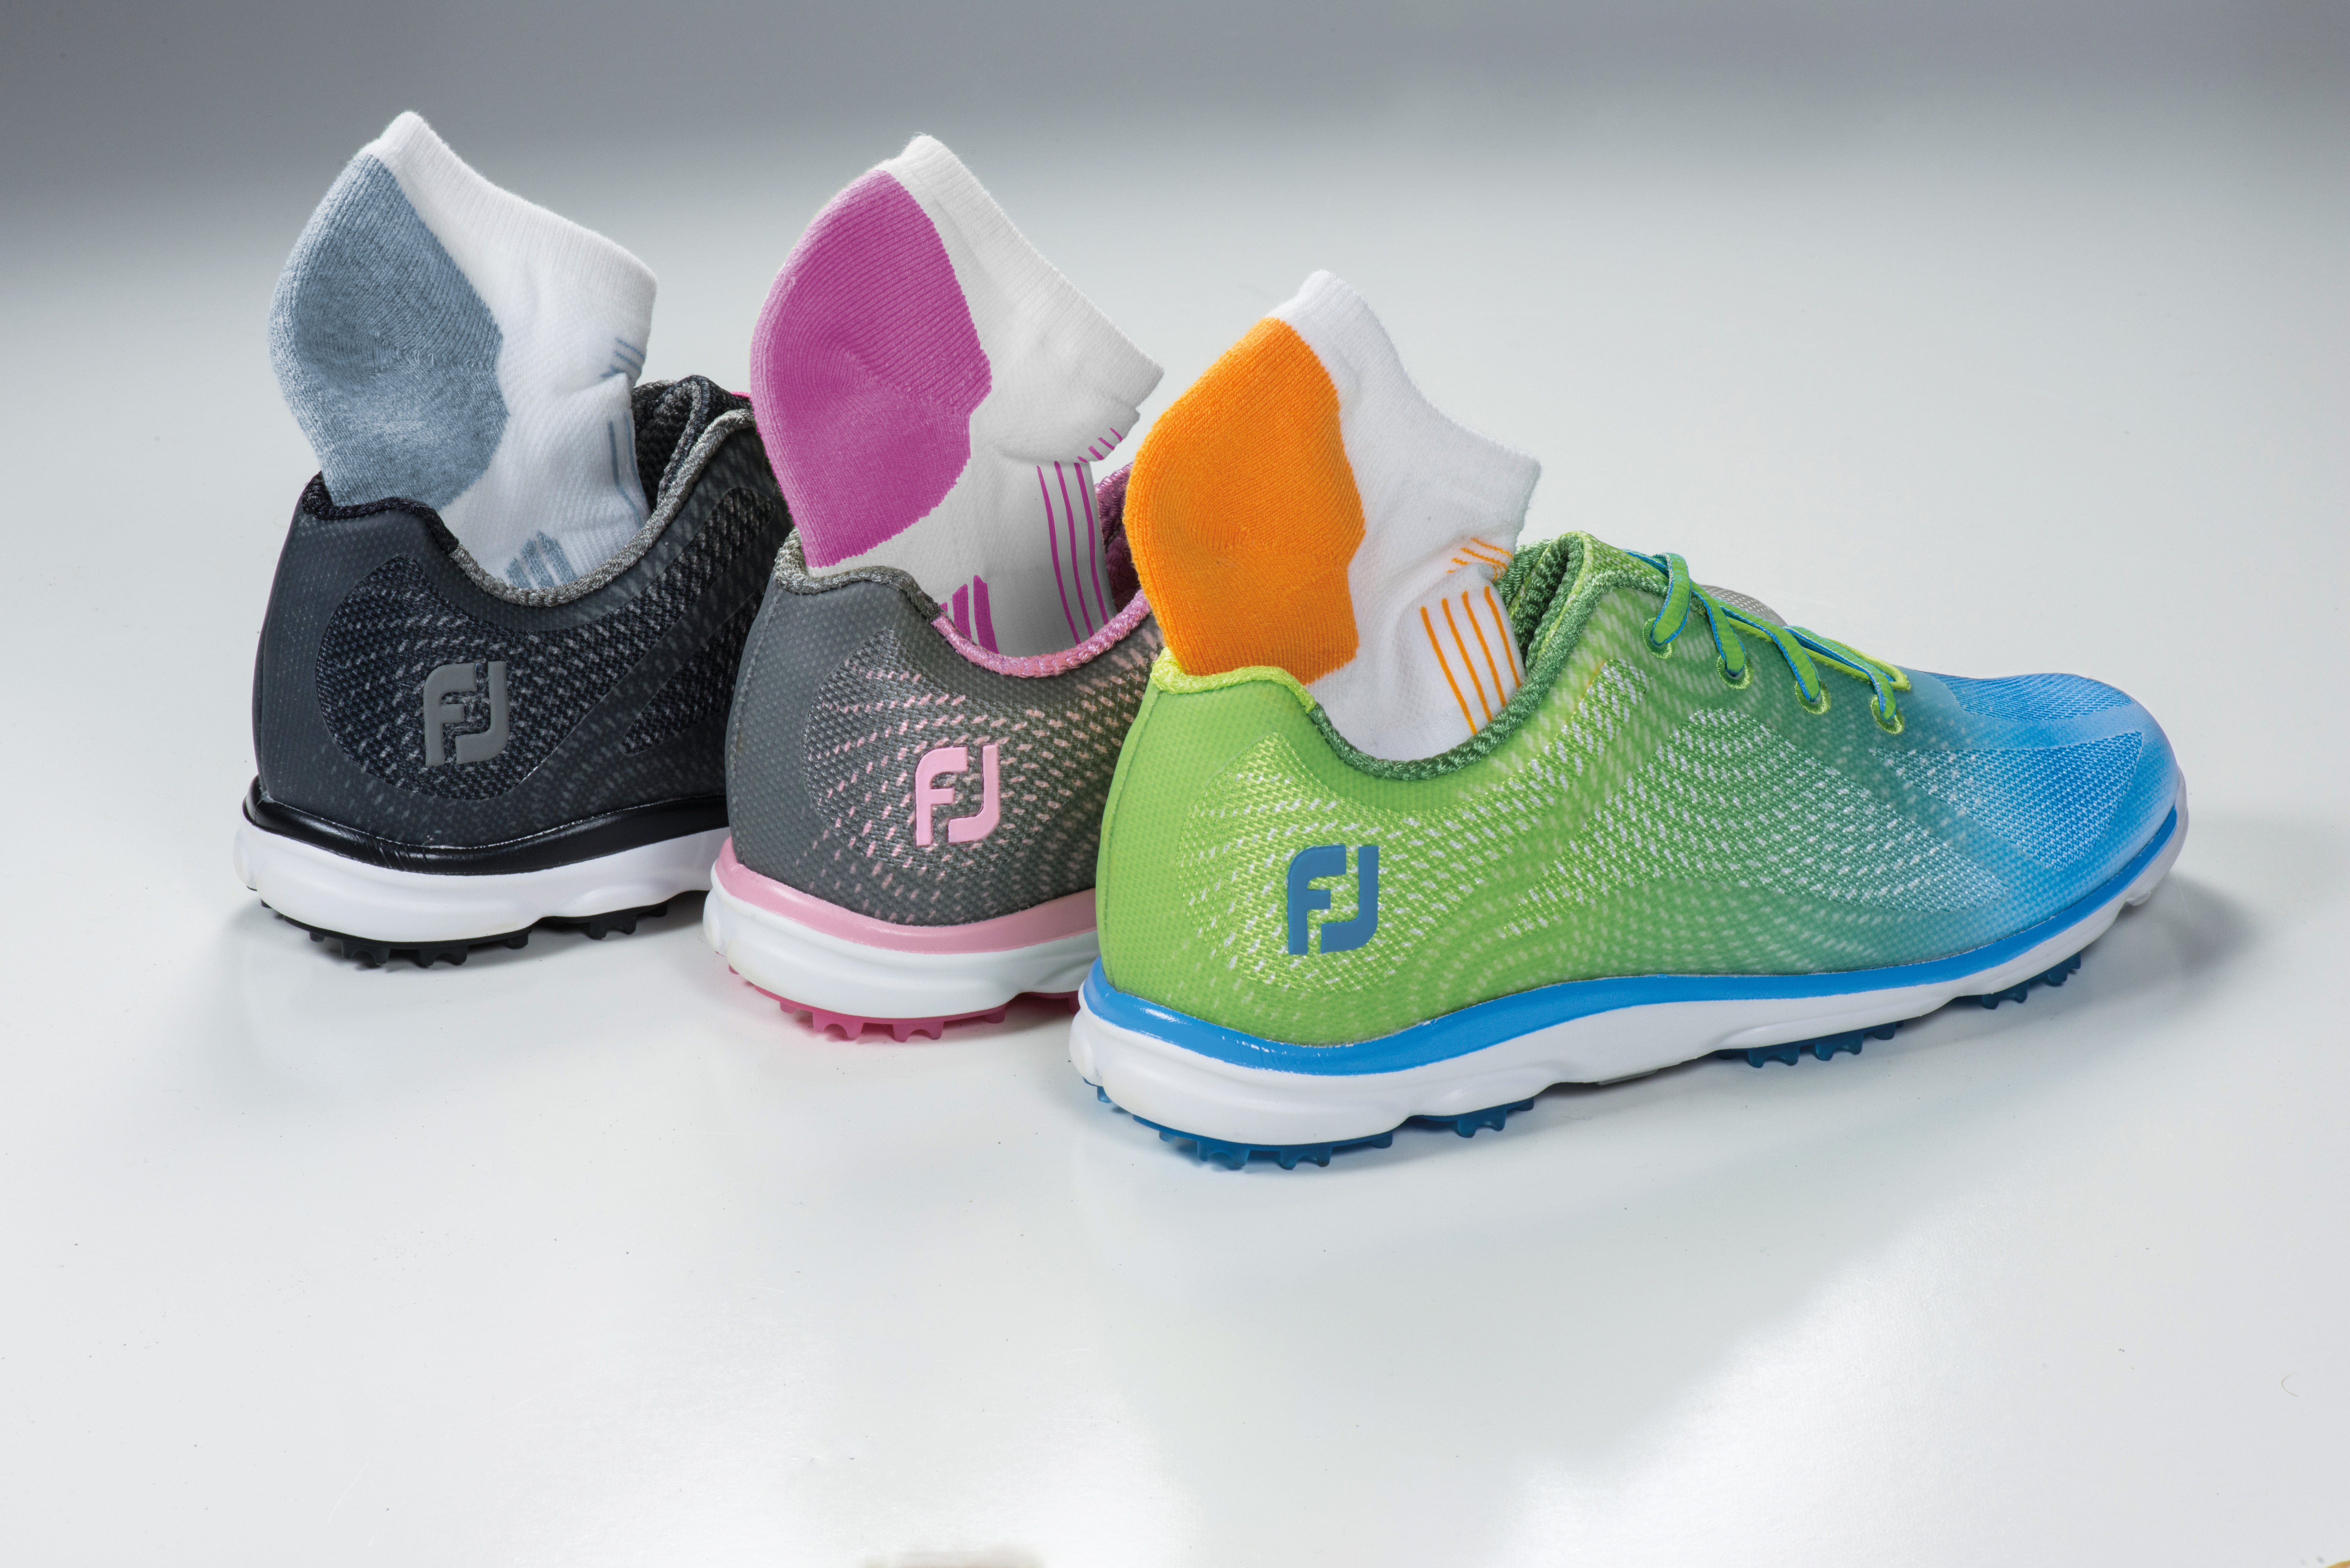 Footjoy Ladies Spikeless Golf Shoes Uk